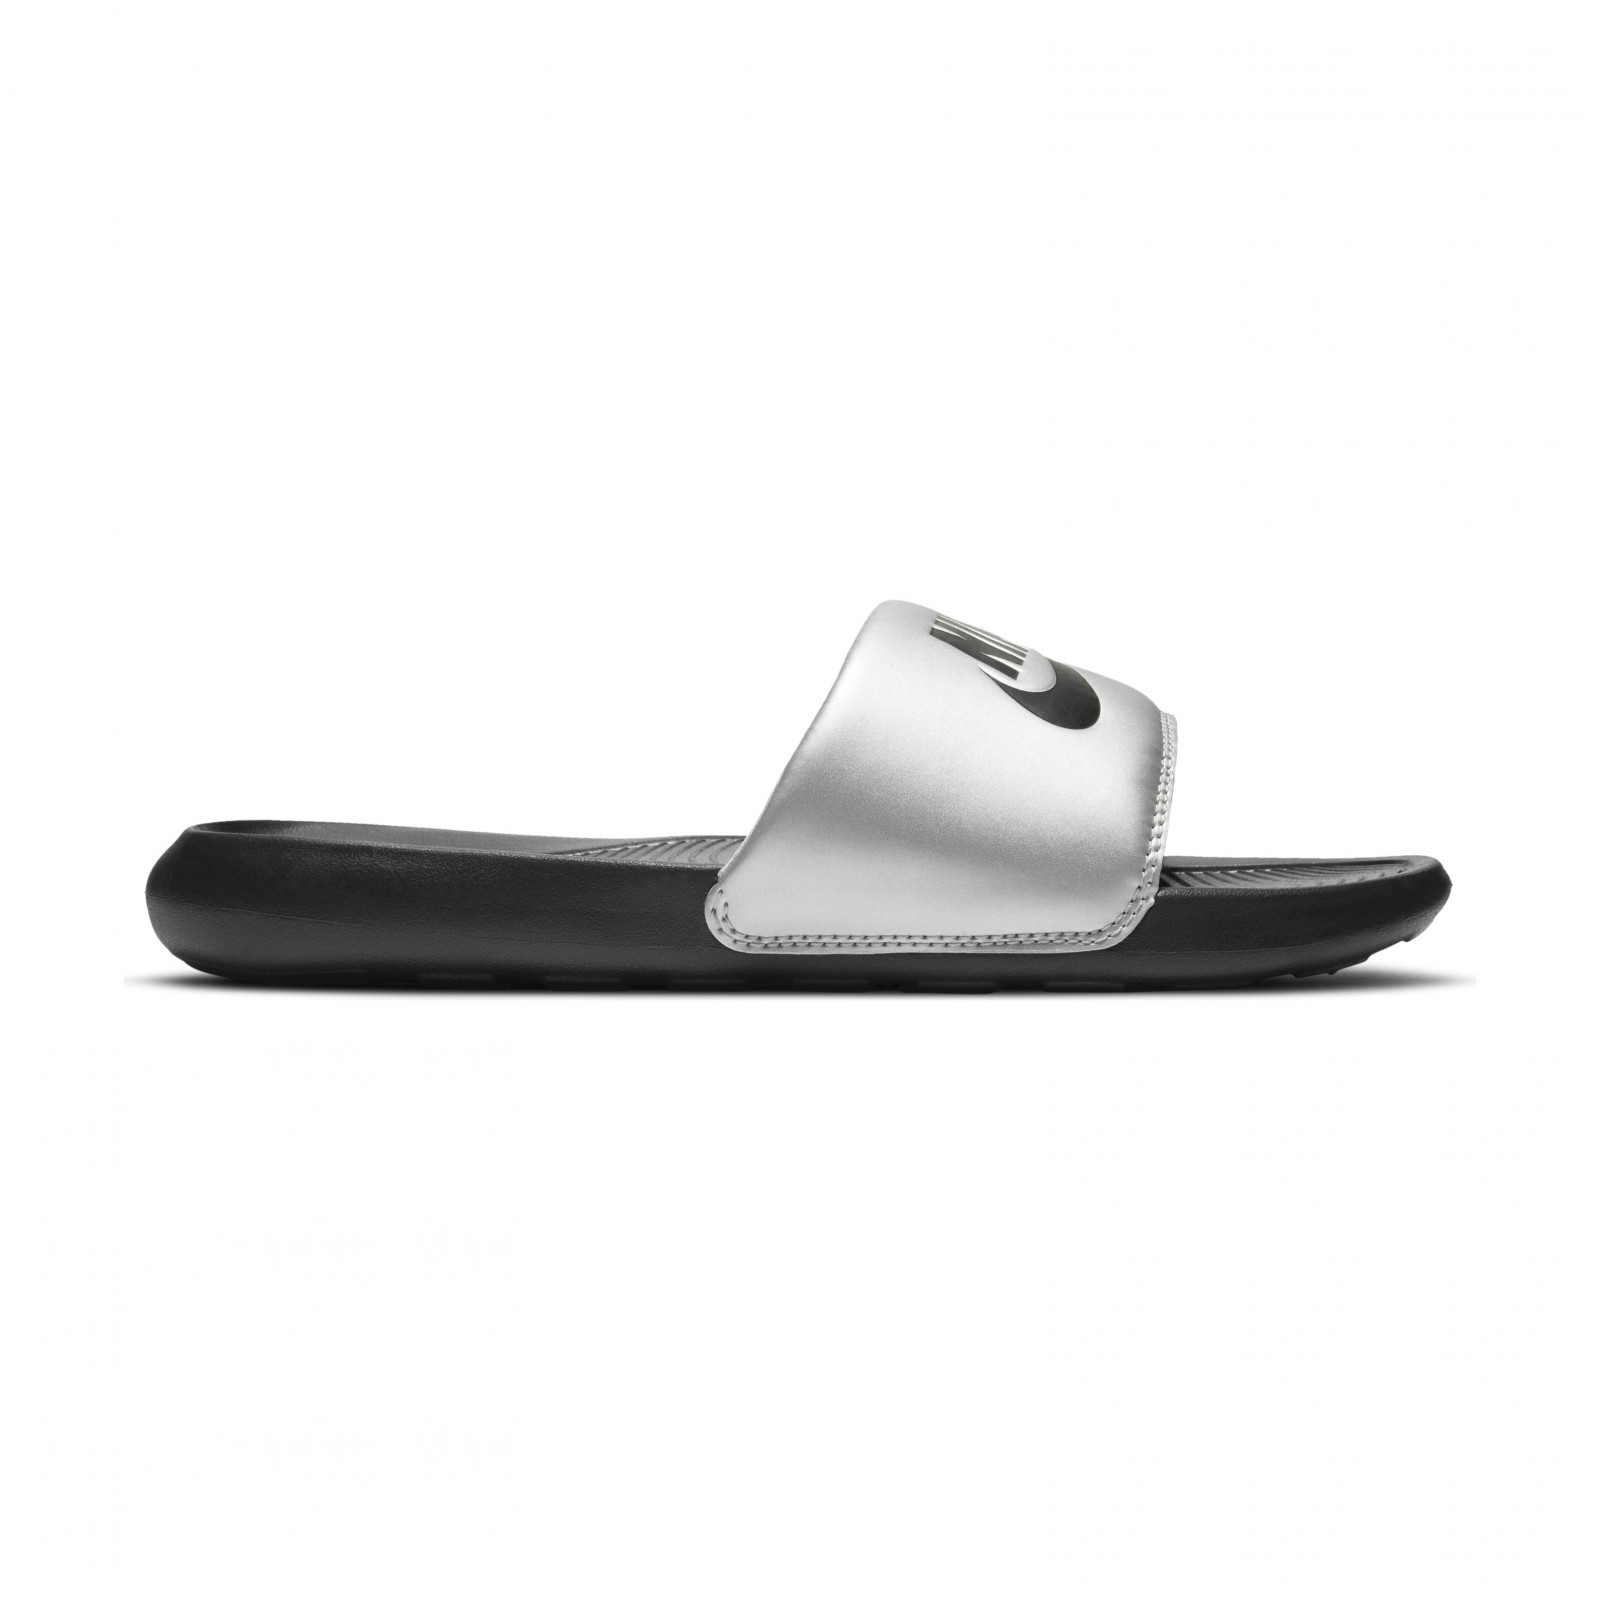 Nike Victori One BLACK/BLACK-METALLIC SILVER